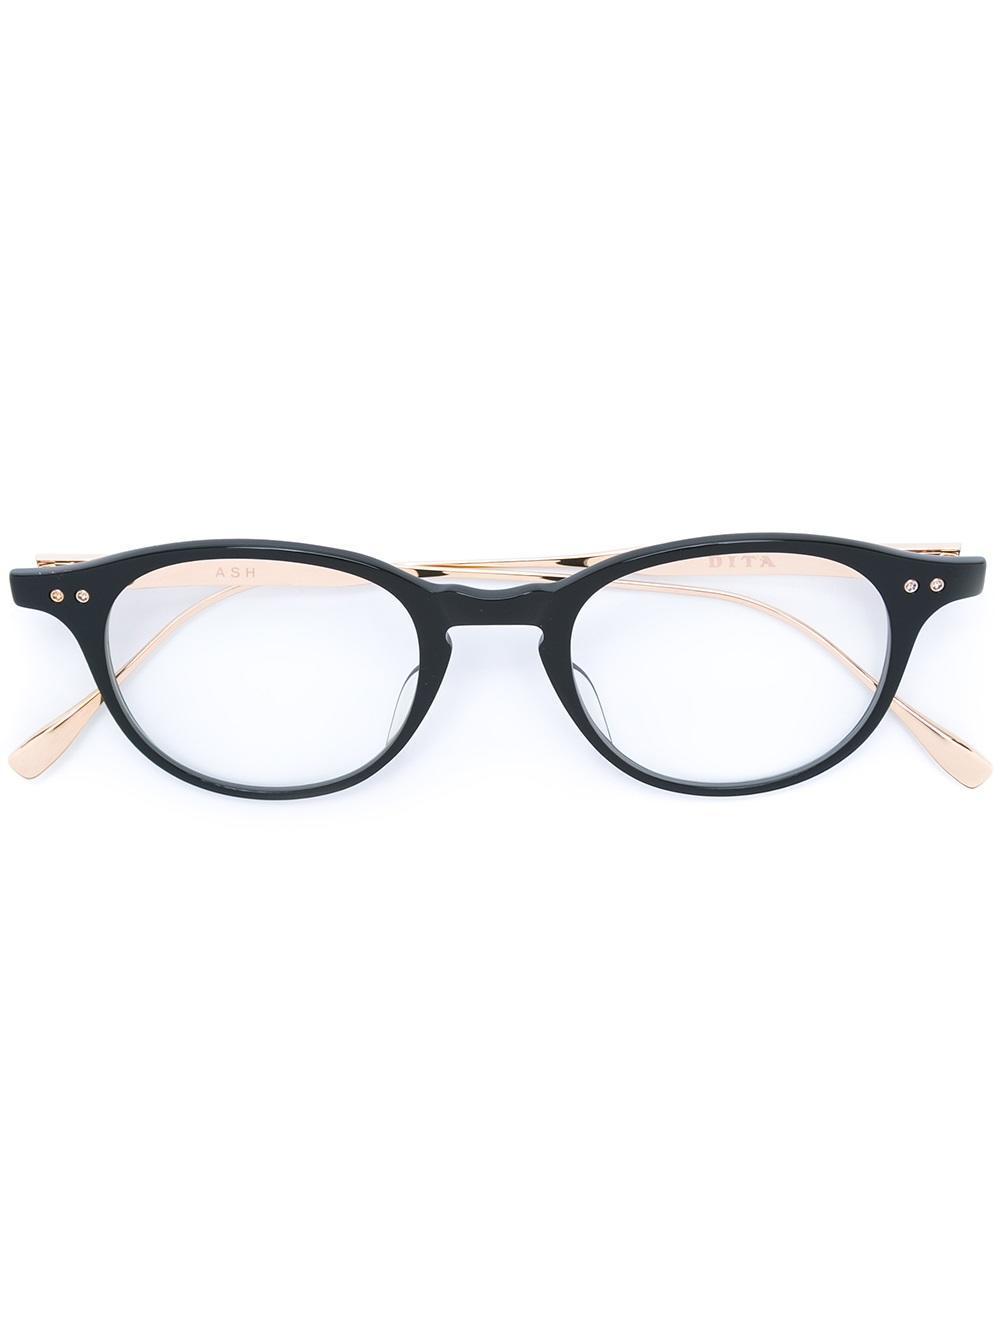 aa8b9282af8 Dita Eyewear  ash  Glasses in Black - Lyst